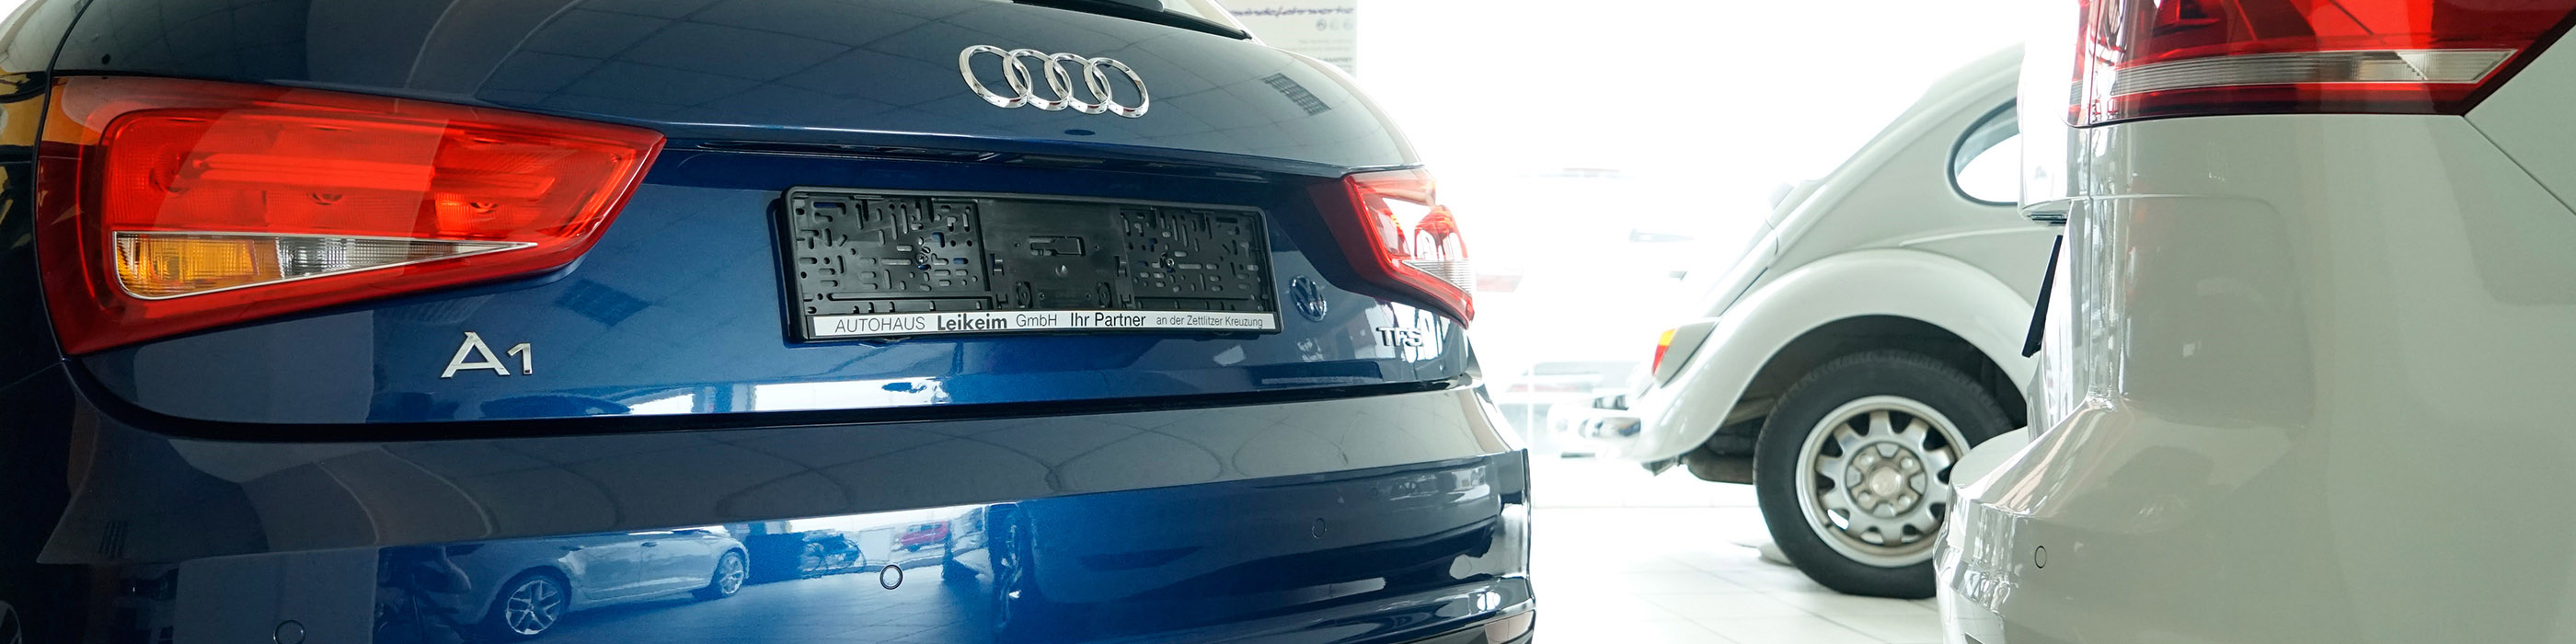 Autohaus Leikeim Marktzeuln Fahrzeuge Audi VW